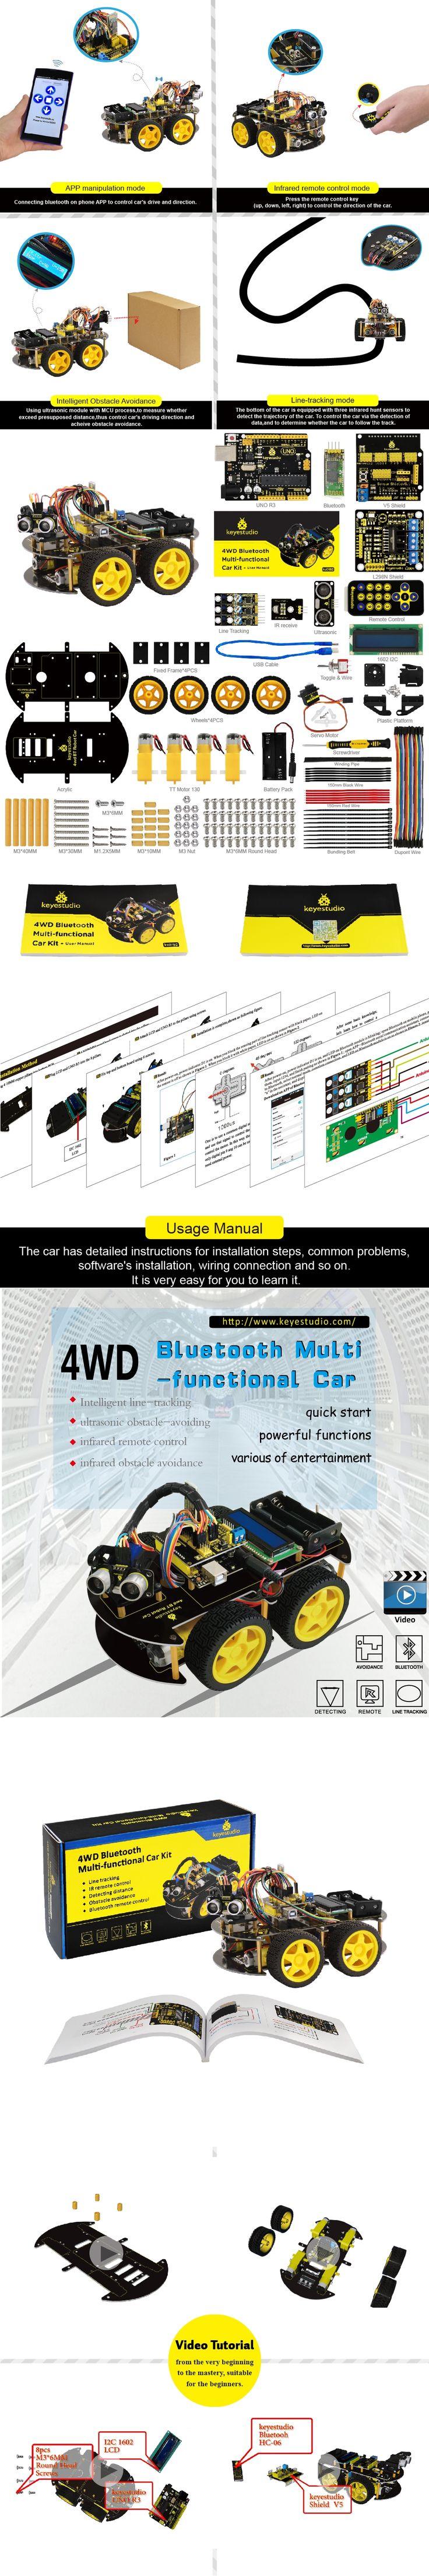 2017 New Year present!Keyestudio 4WD Bluetooth Multi-functional DIY Car +User Manual/with screwdriver For Arduino Robot starter